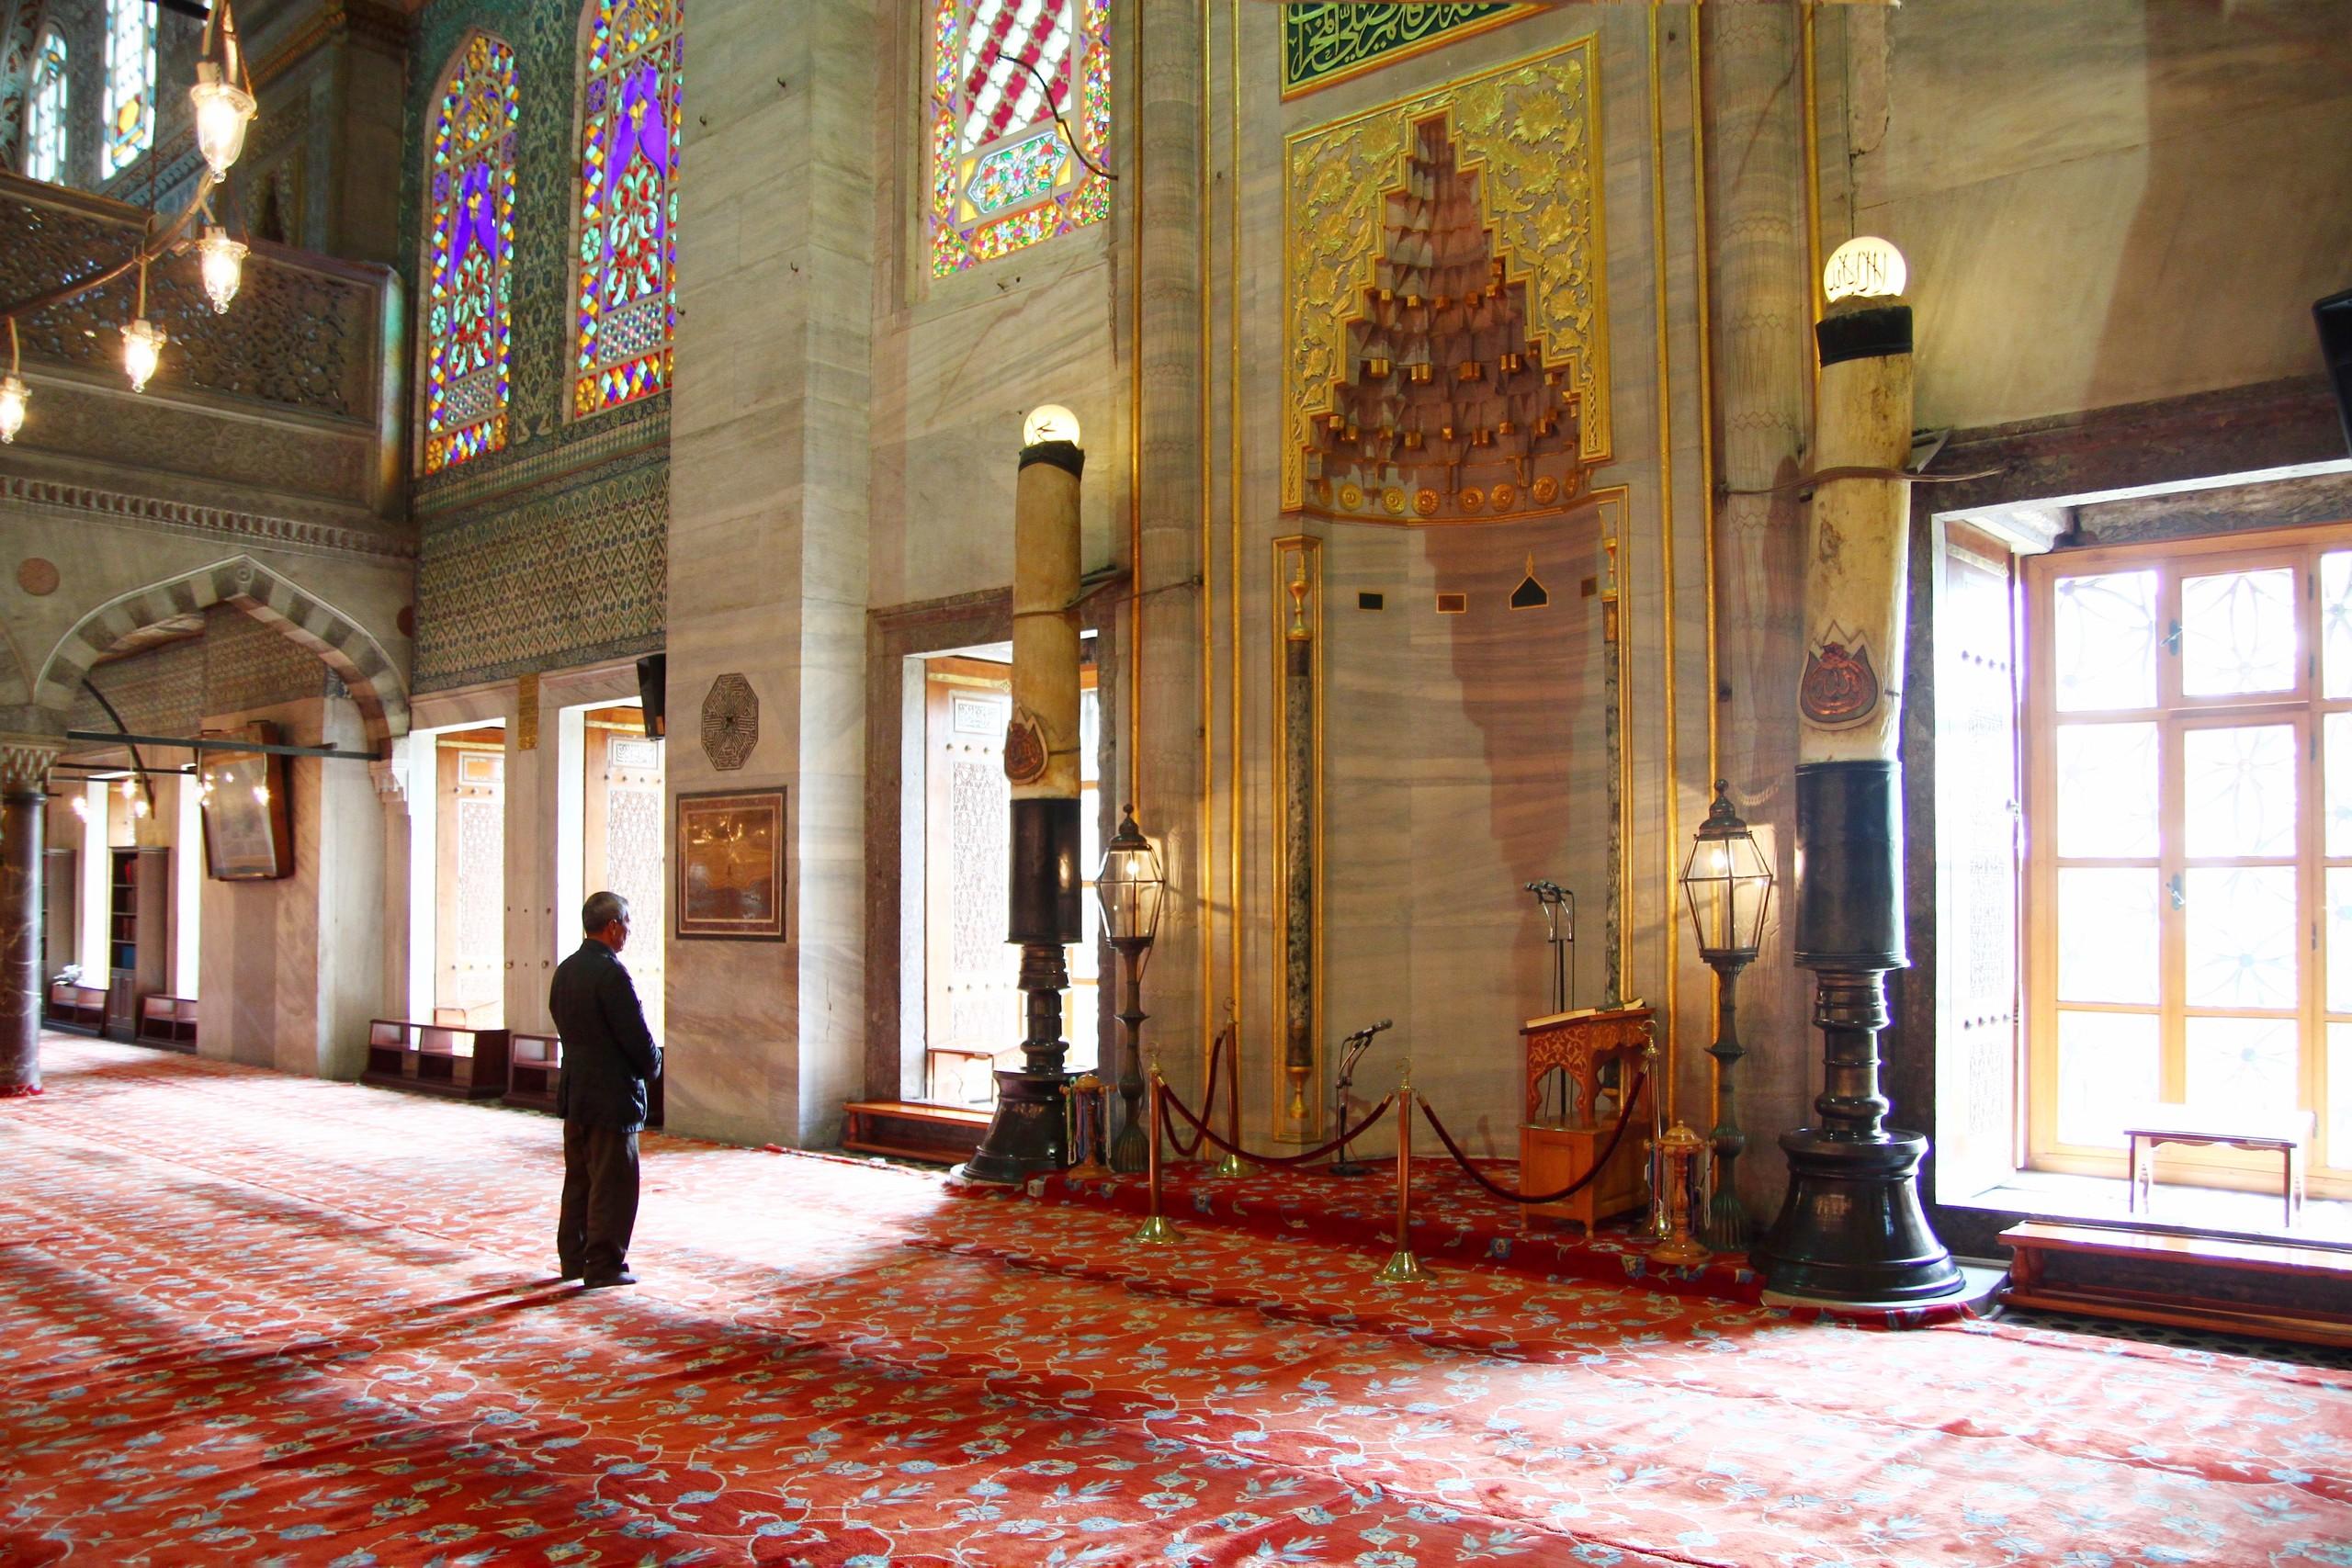 Pırlantadan Kubbeler #5: Sultanahmed - pPM37n - Pırlantadan Kubbeler #5: Sultanahmed